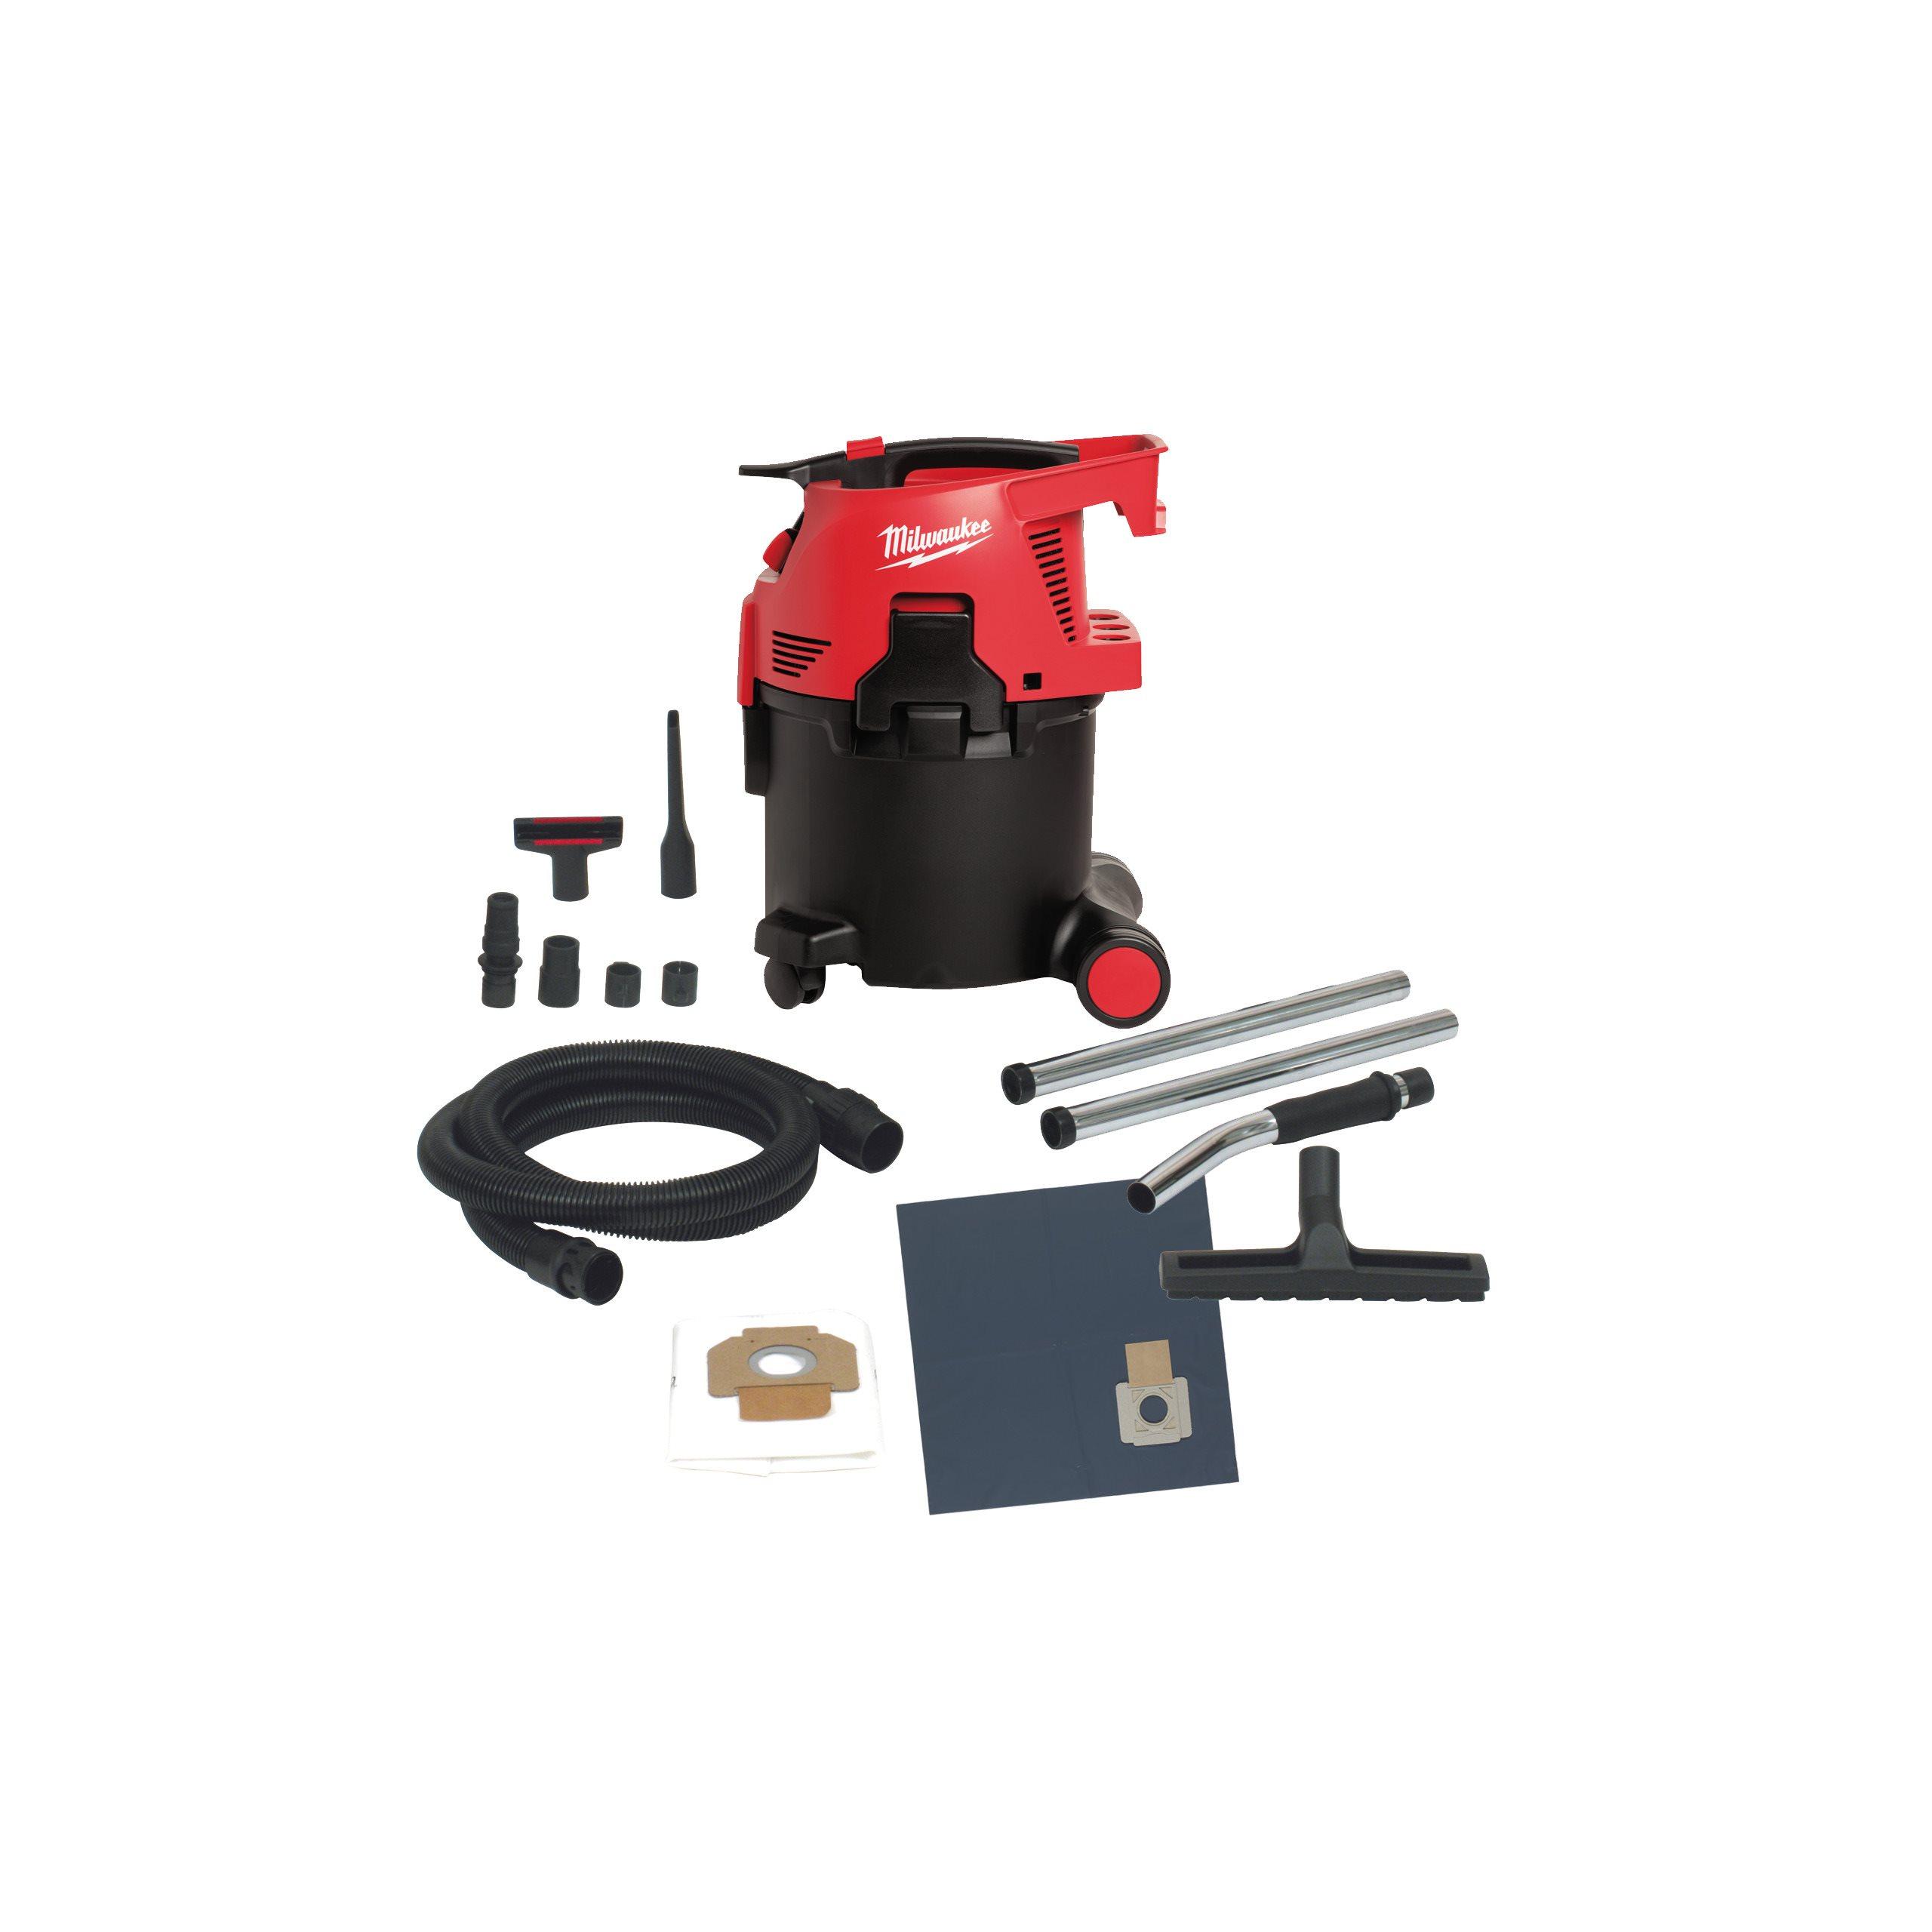 25L L klasse støvsuger | AS 2 250 ELCP | Milwaukee Tools Norge